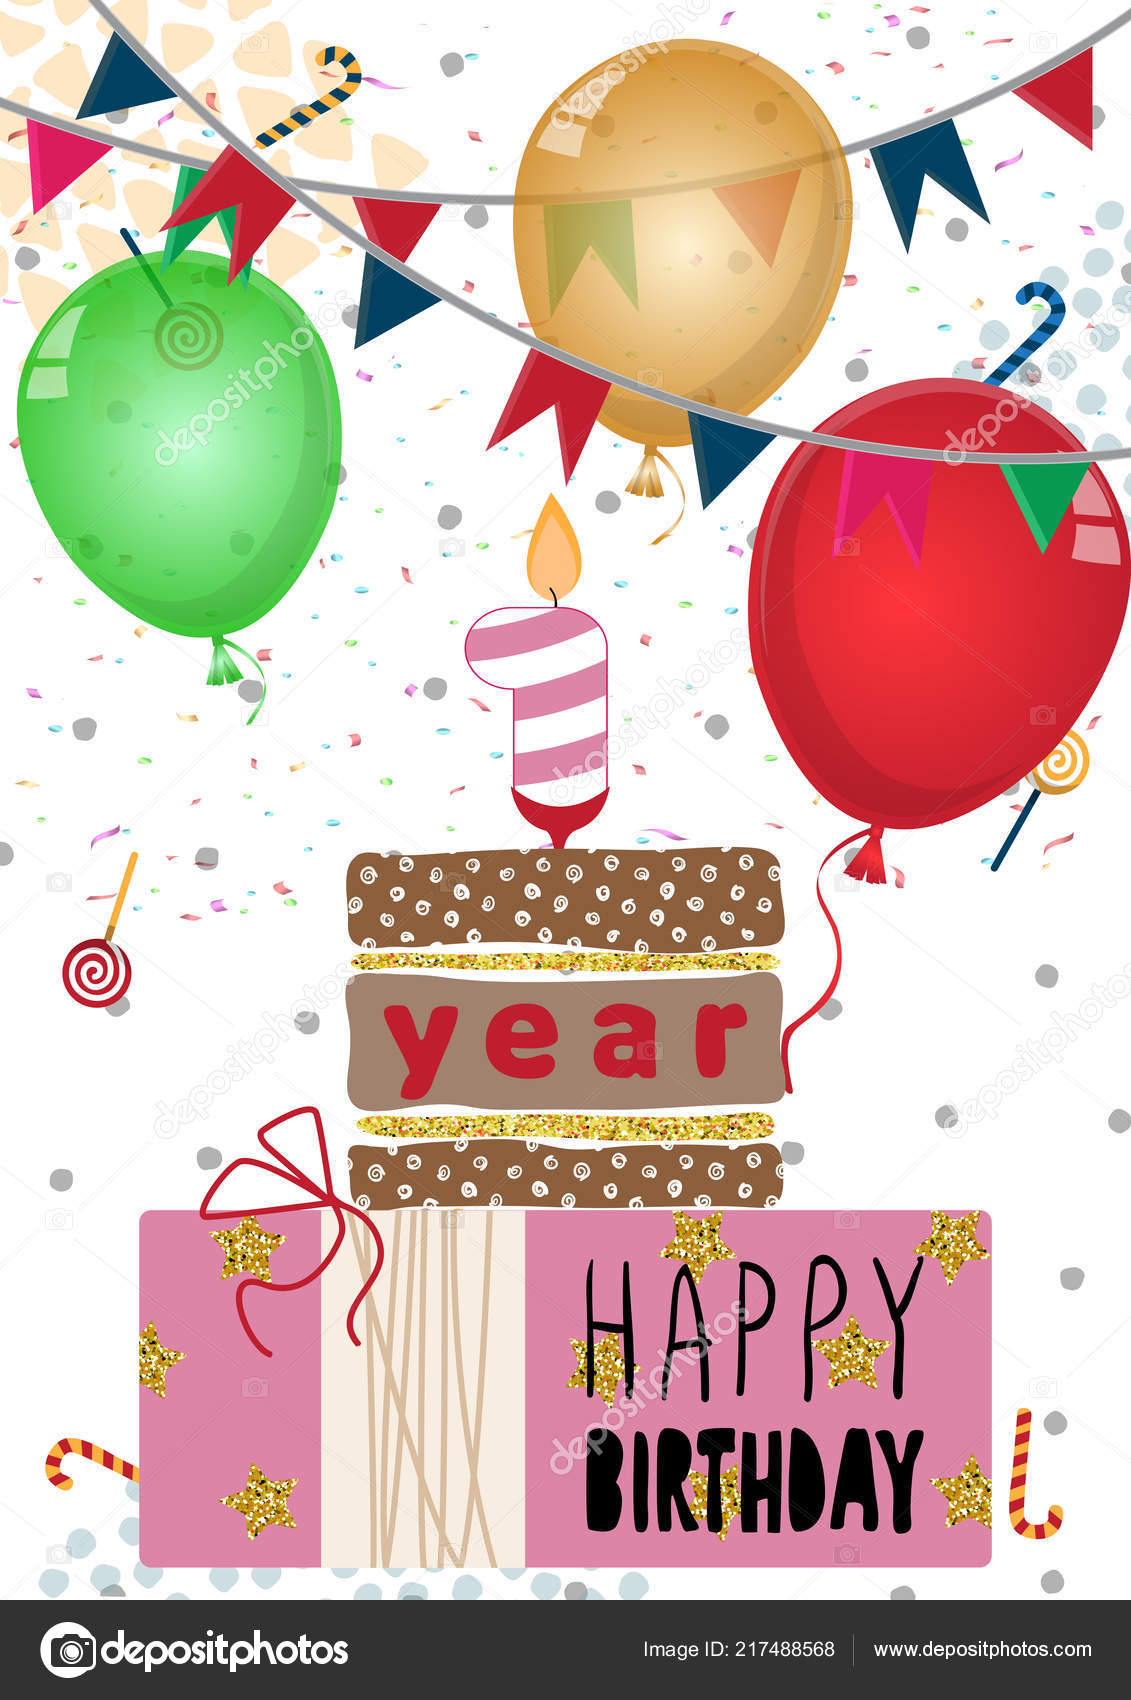 Birthday Card For One Year Old Baby Girl Happy Birthday Card Design For One Year Old Baby Stock Vector C Bezvetrenniy 217488568